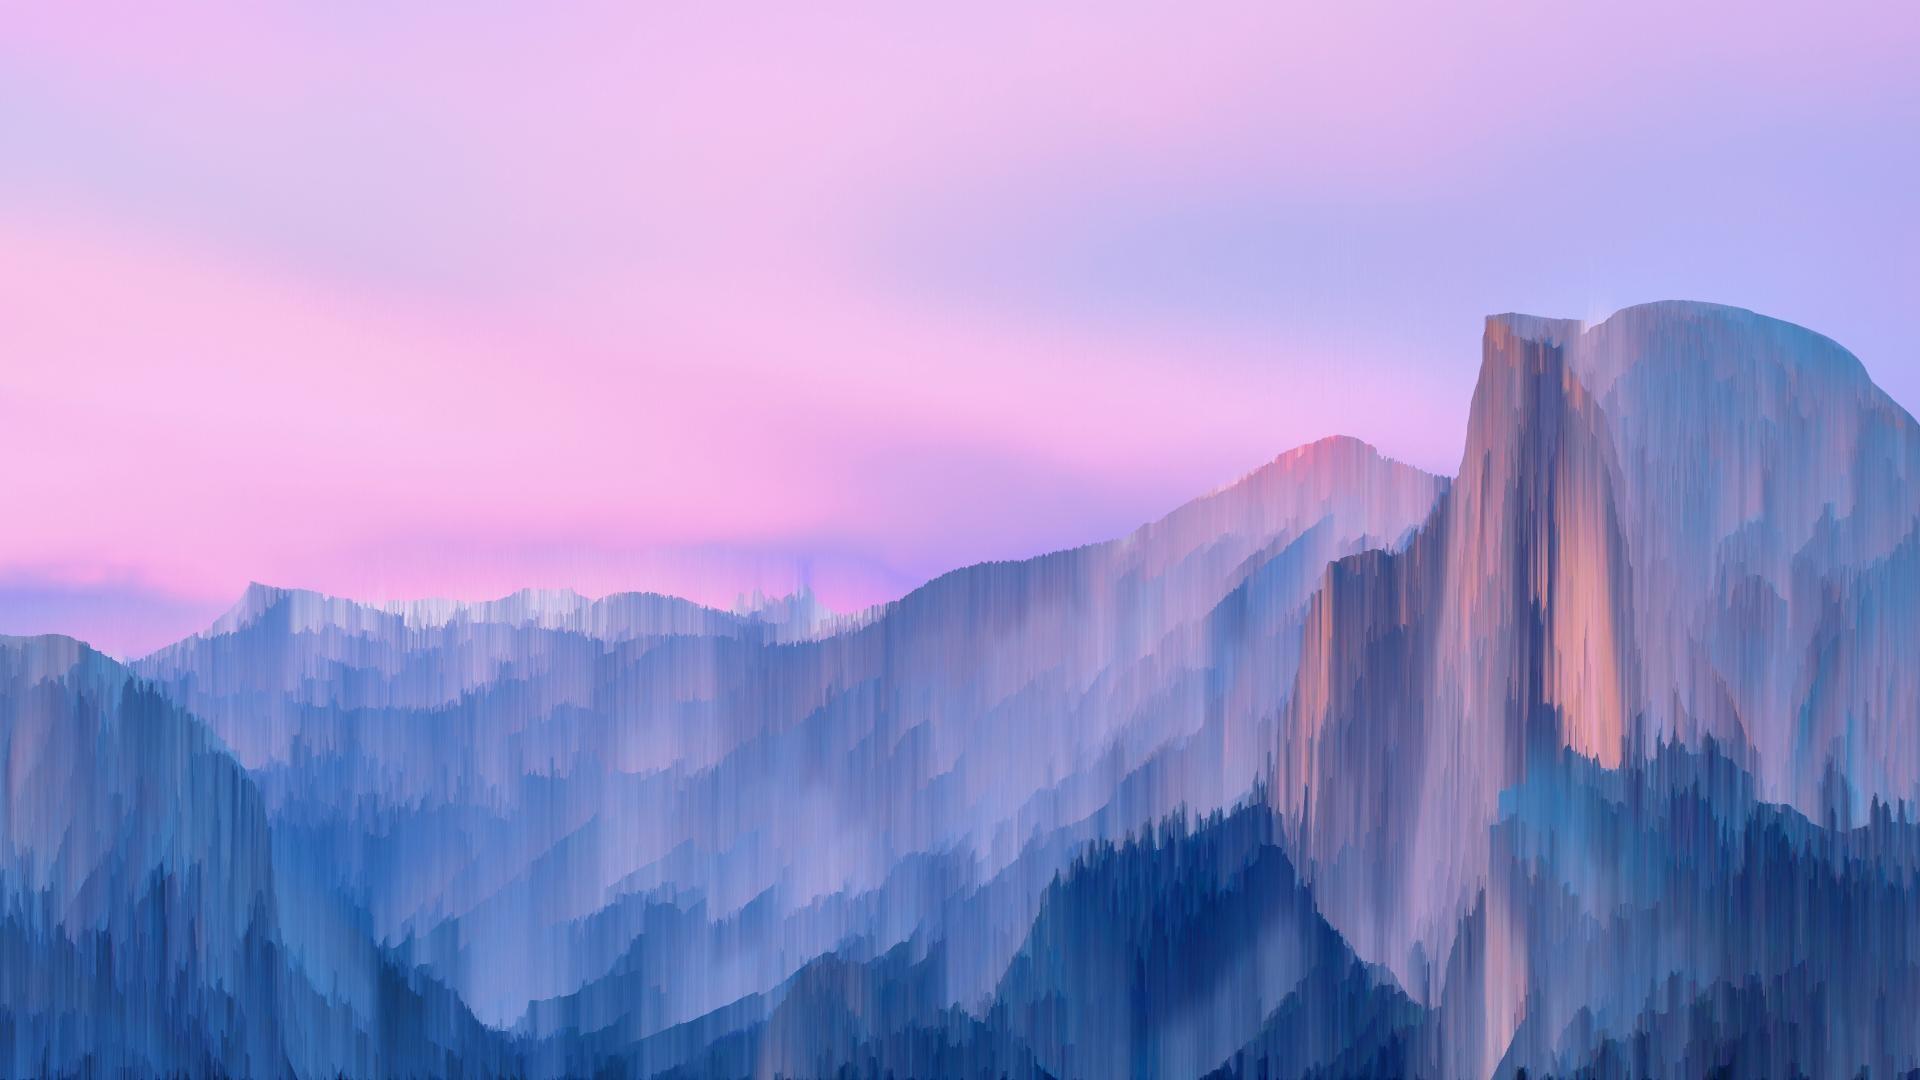 Google Pixel Wallpaper ① Download Free High Resolution Wallpapers